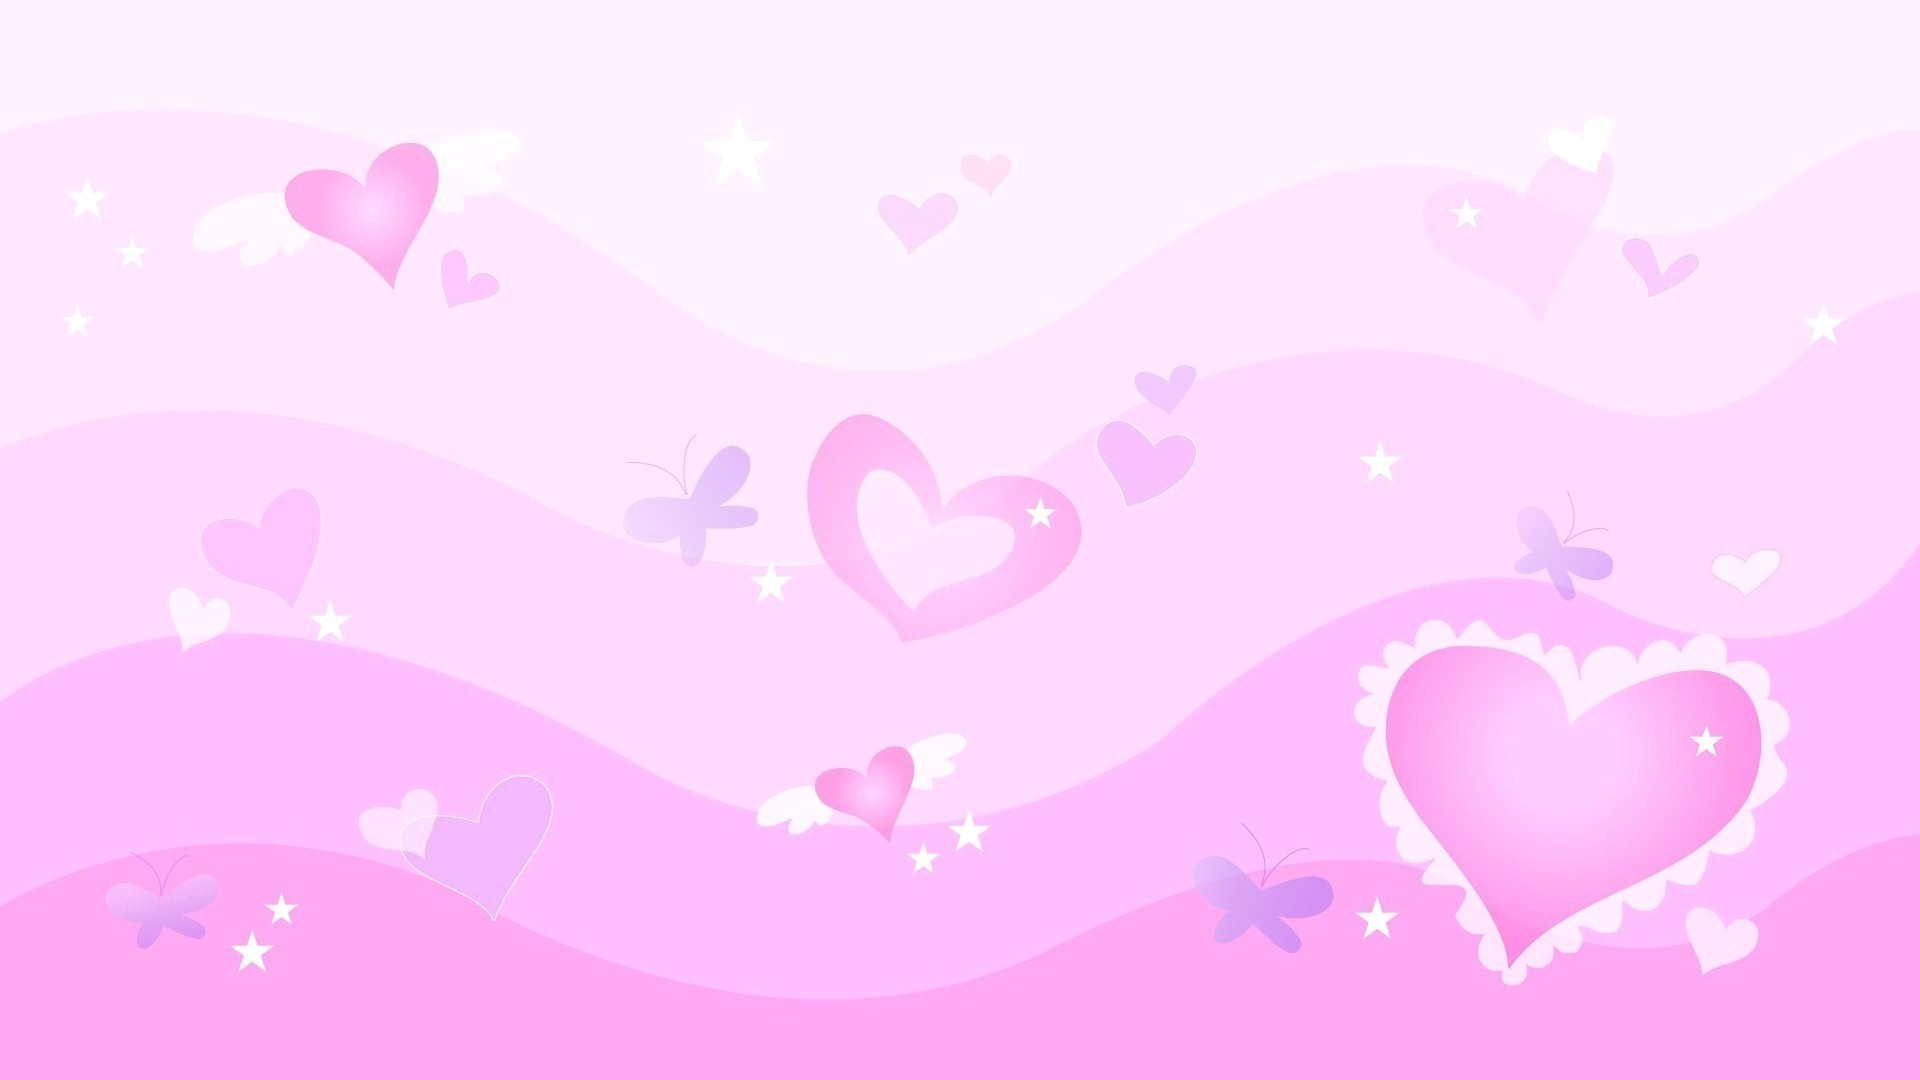 … pink heart background wallpaper wallpapersafari …